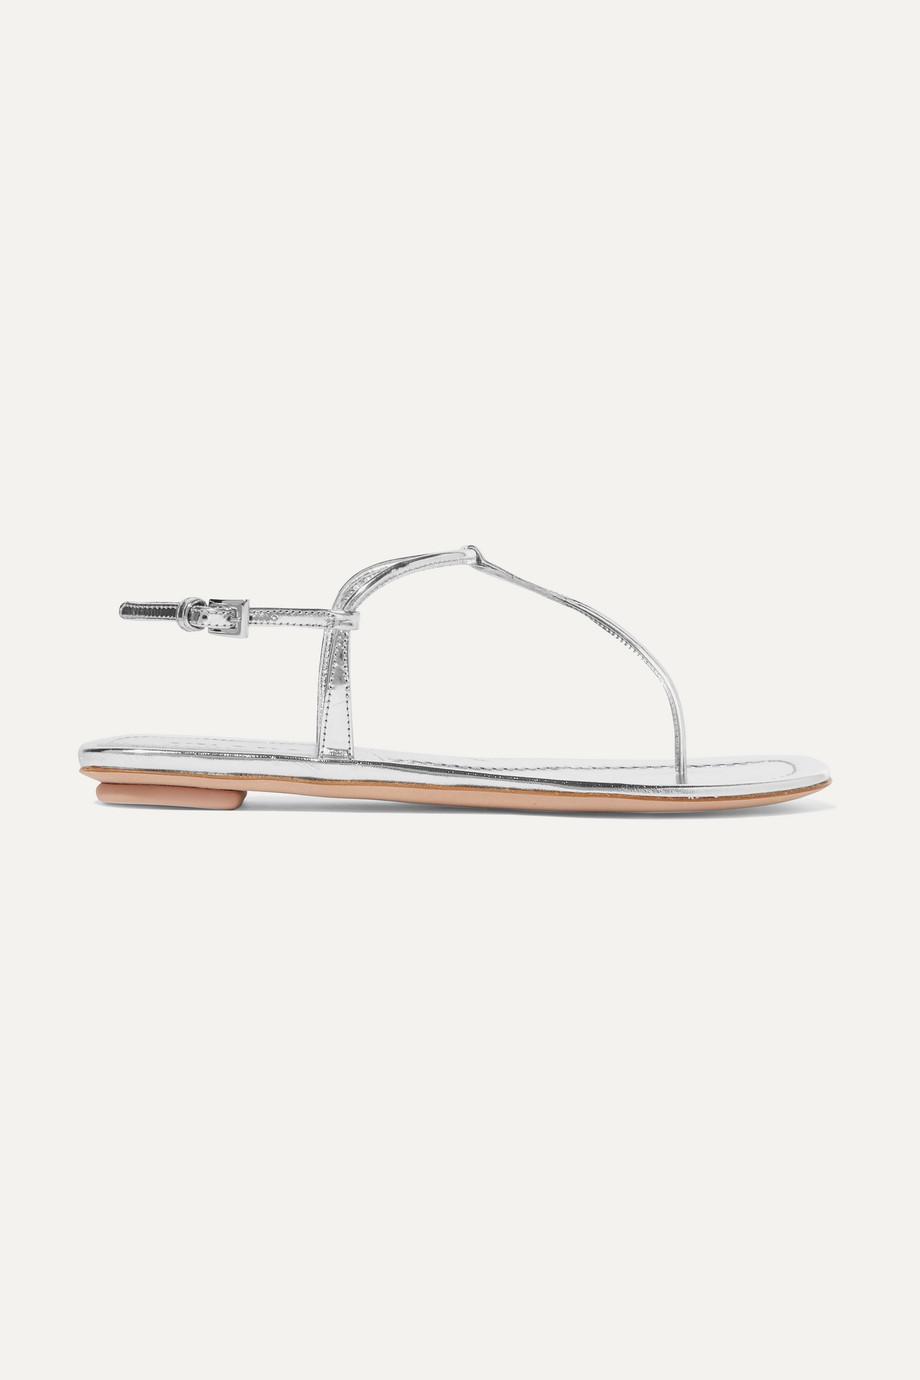 Prada Sandales en cuir métallisé